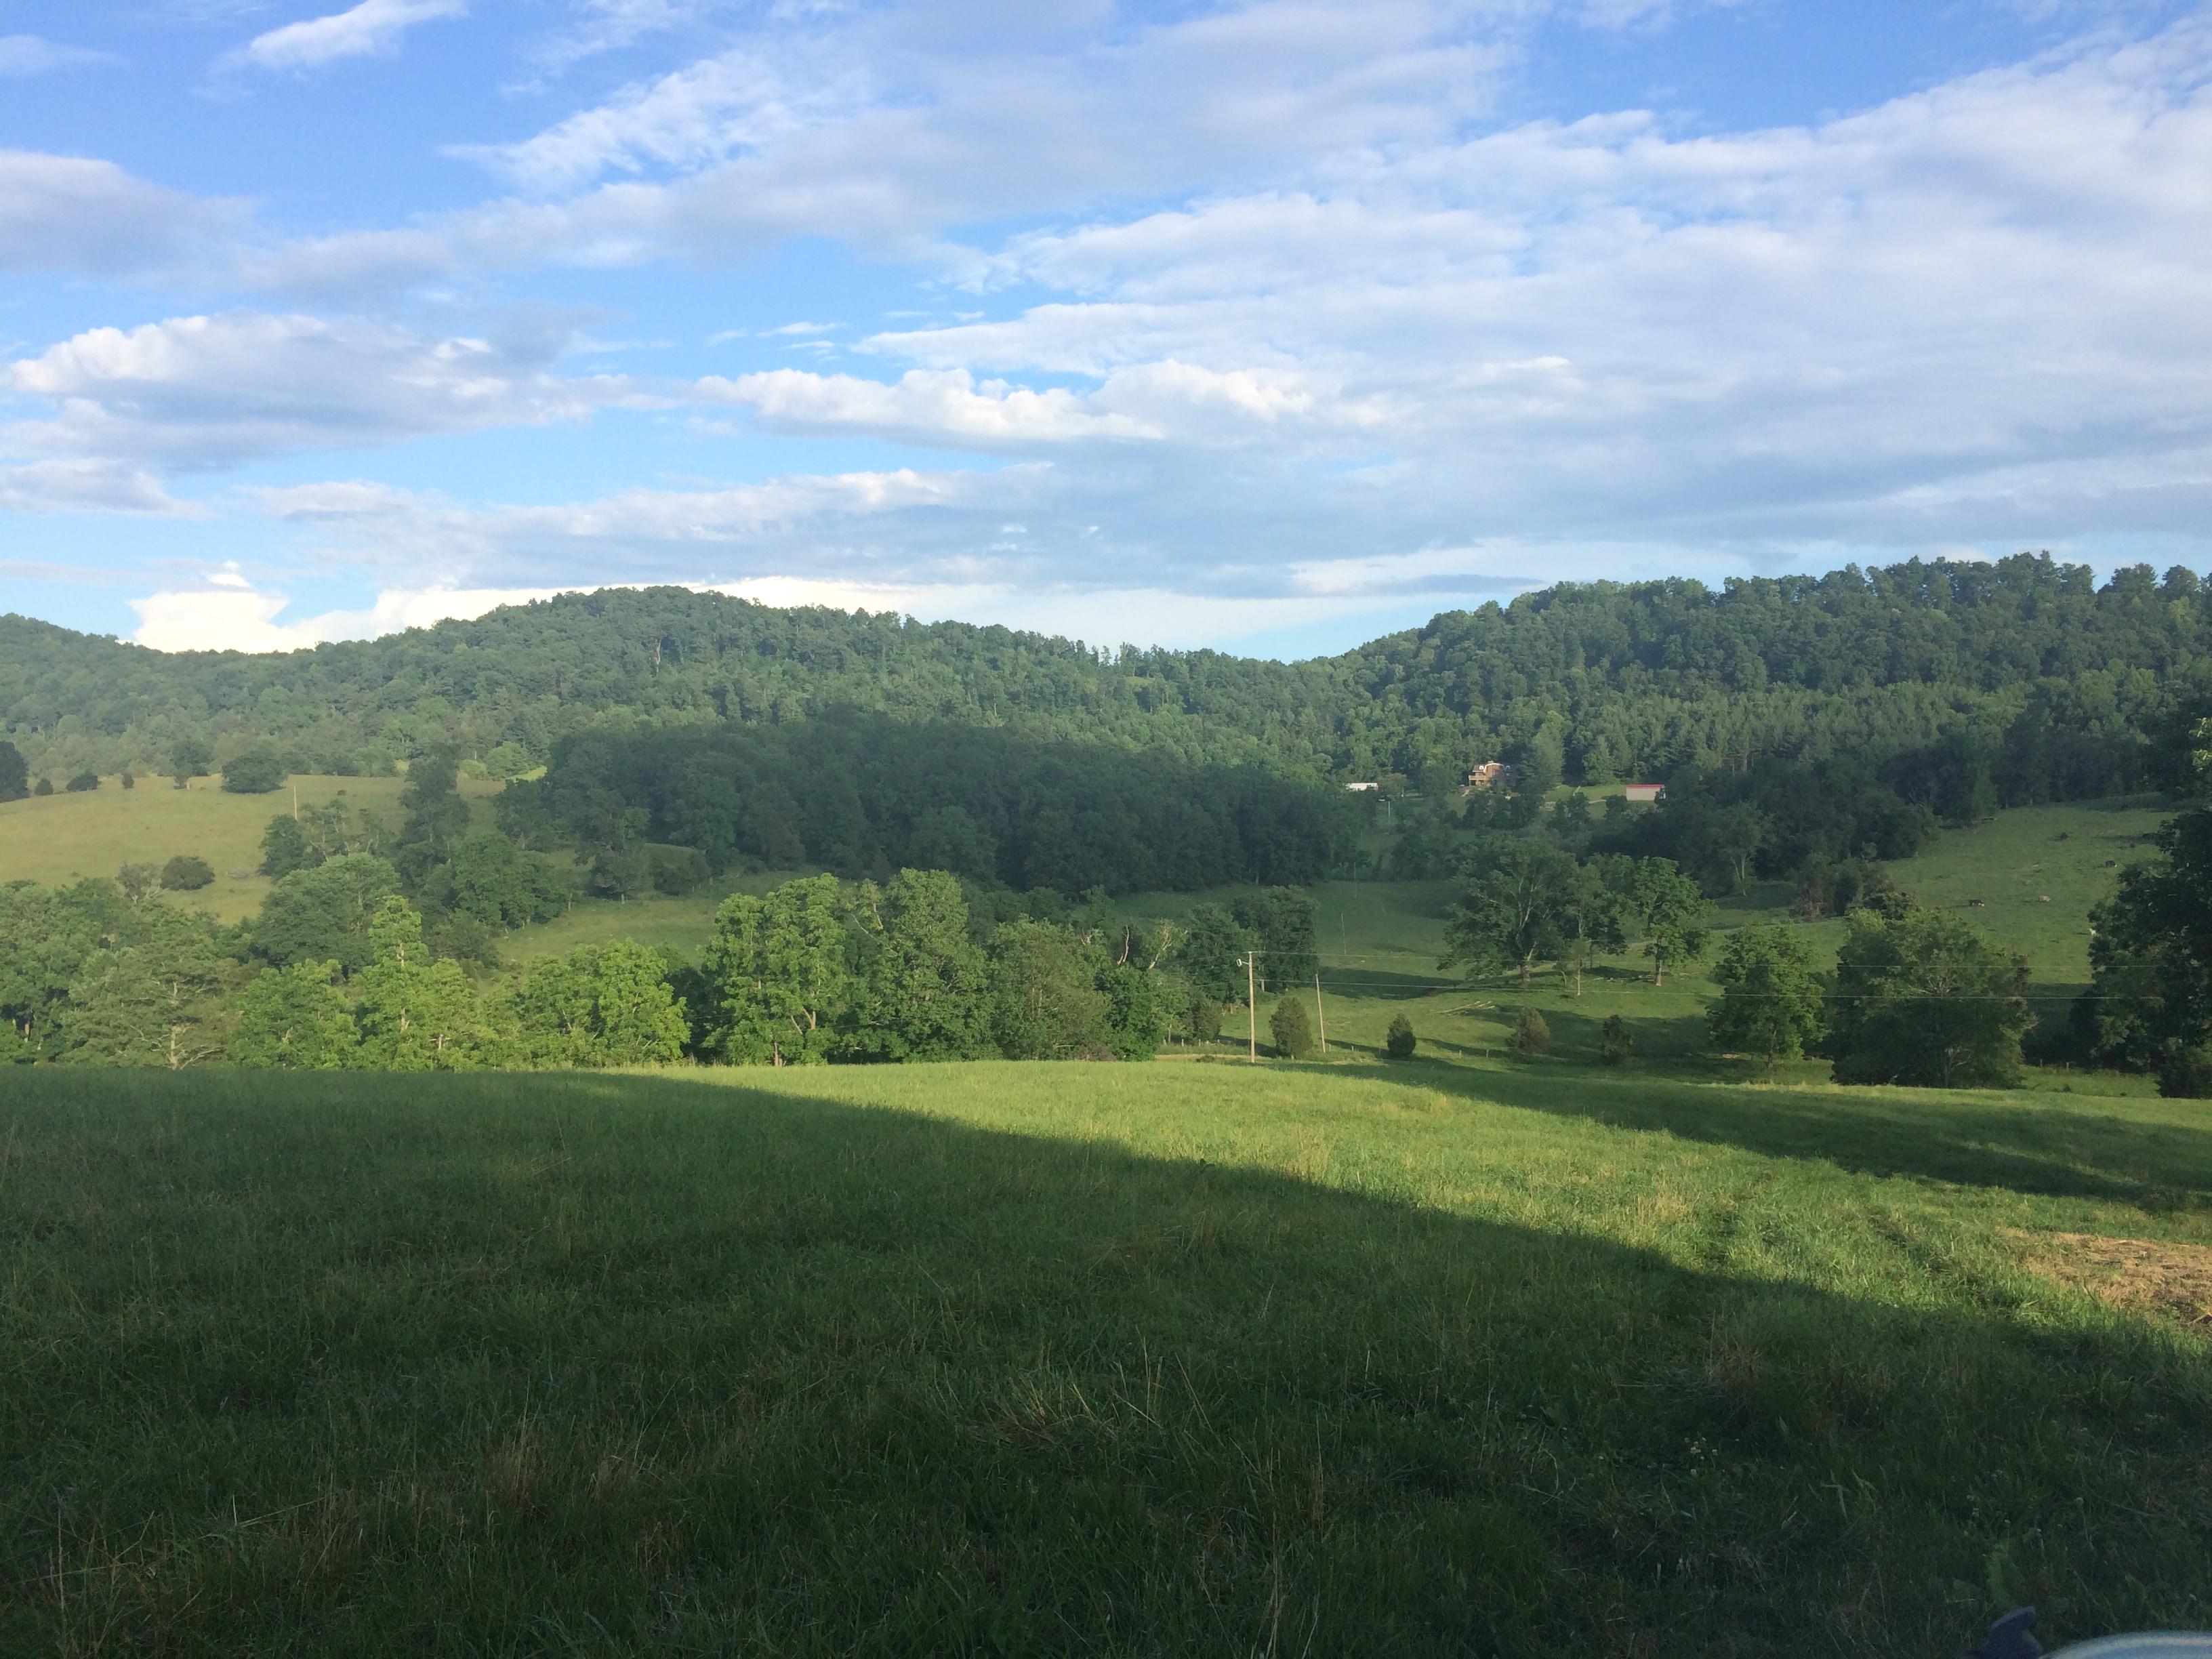 000 Hogback Road, Wytheville, Virginia 24382